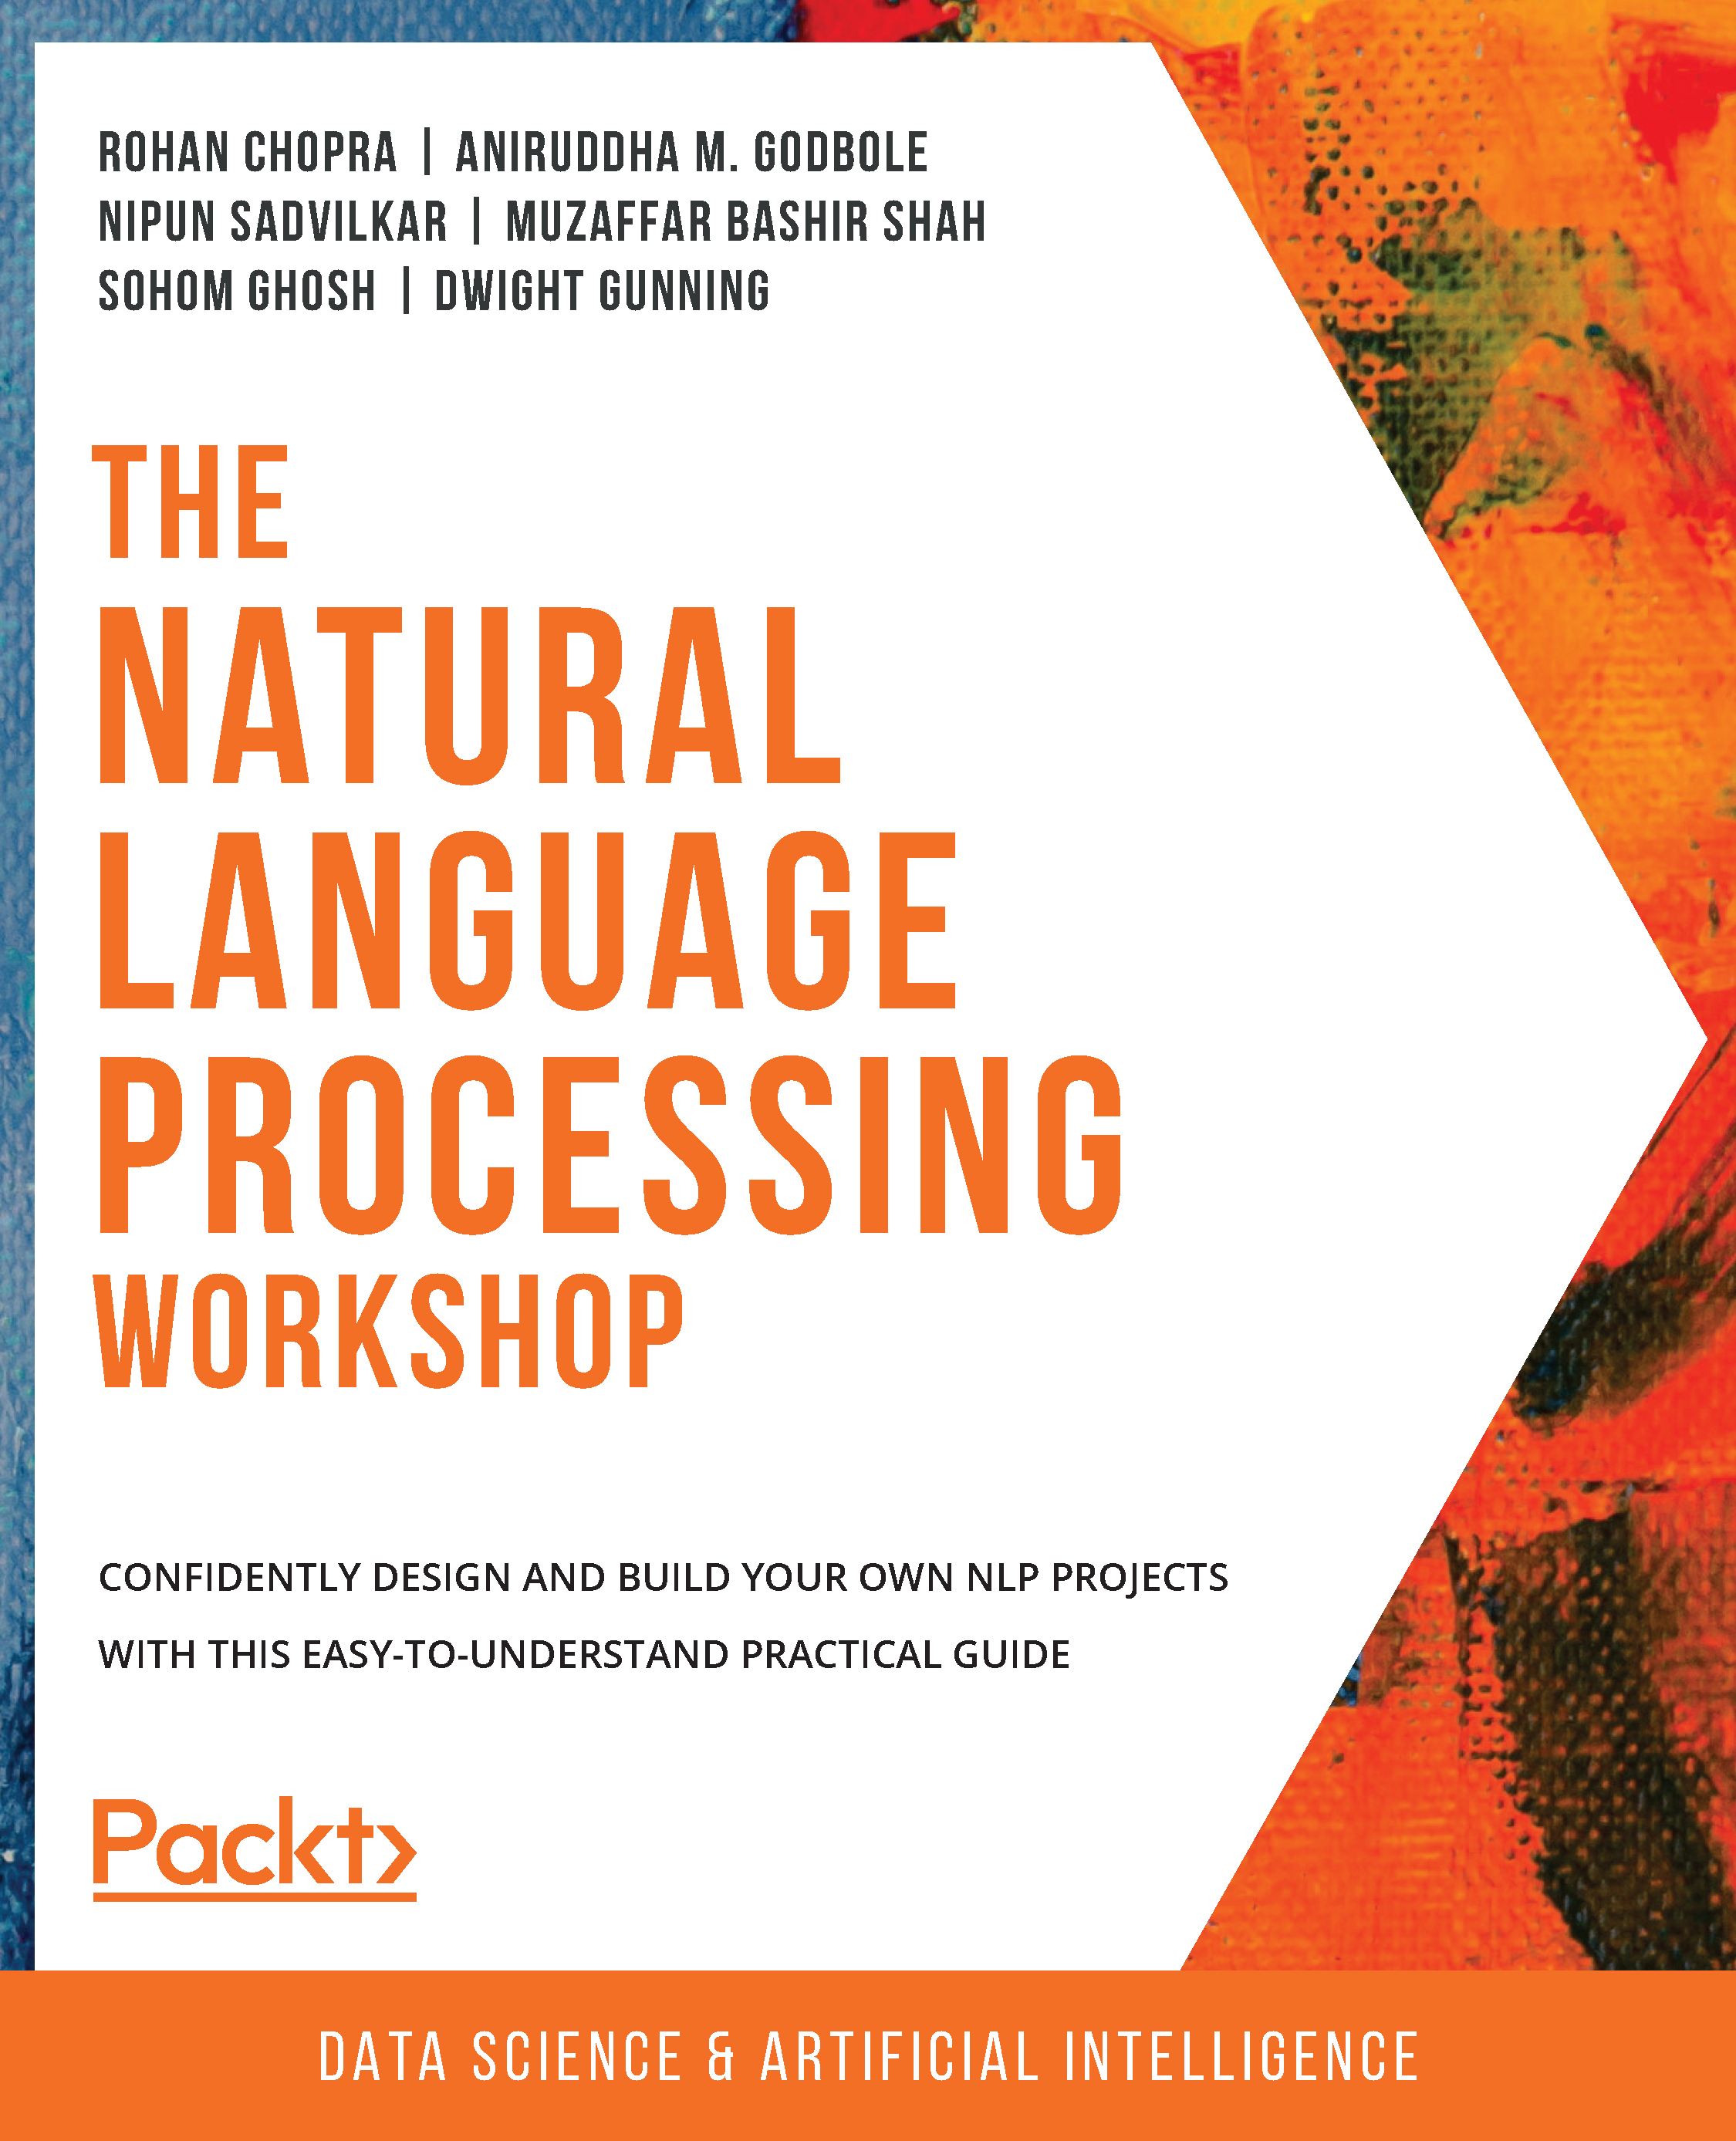 The Natural Language Processing Workshop